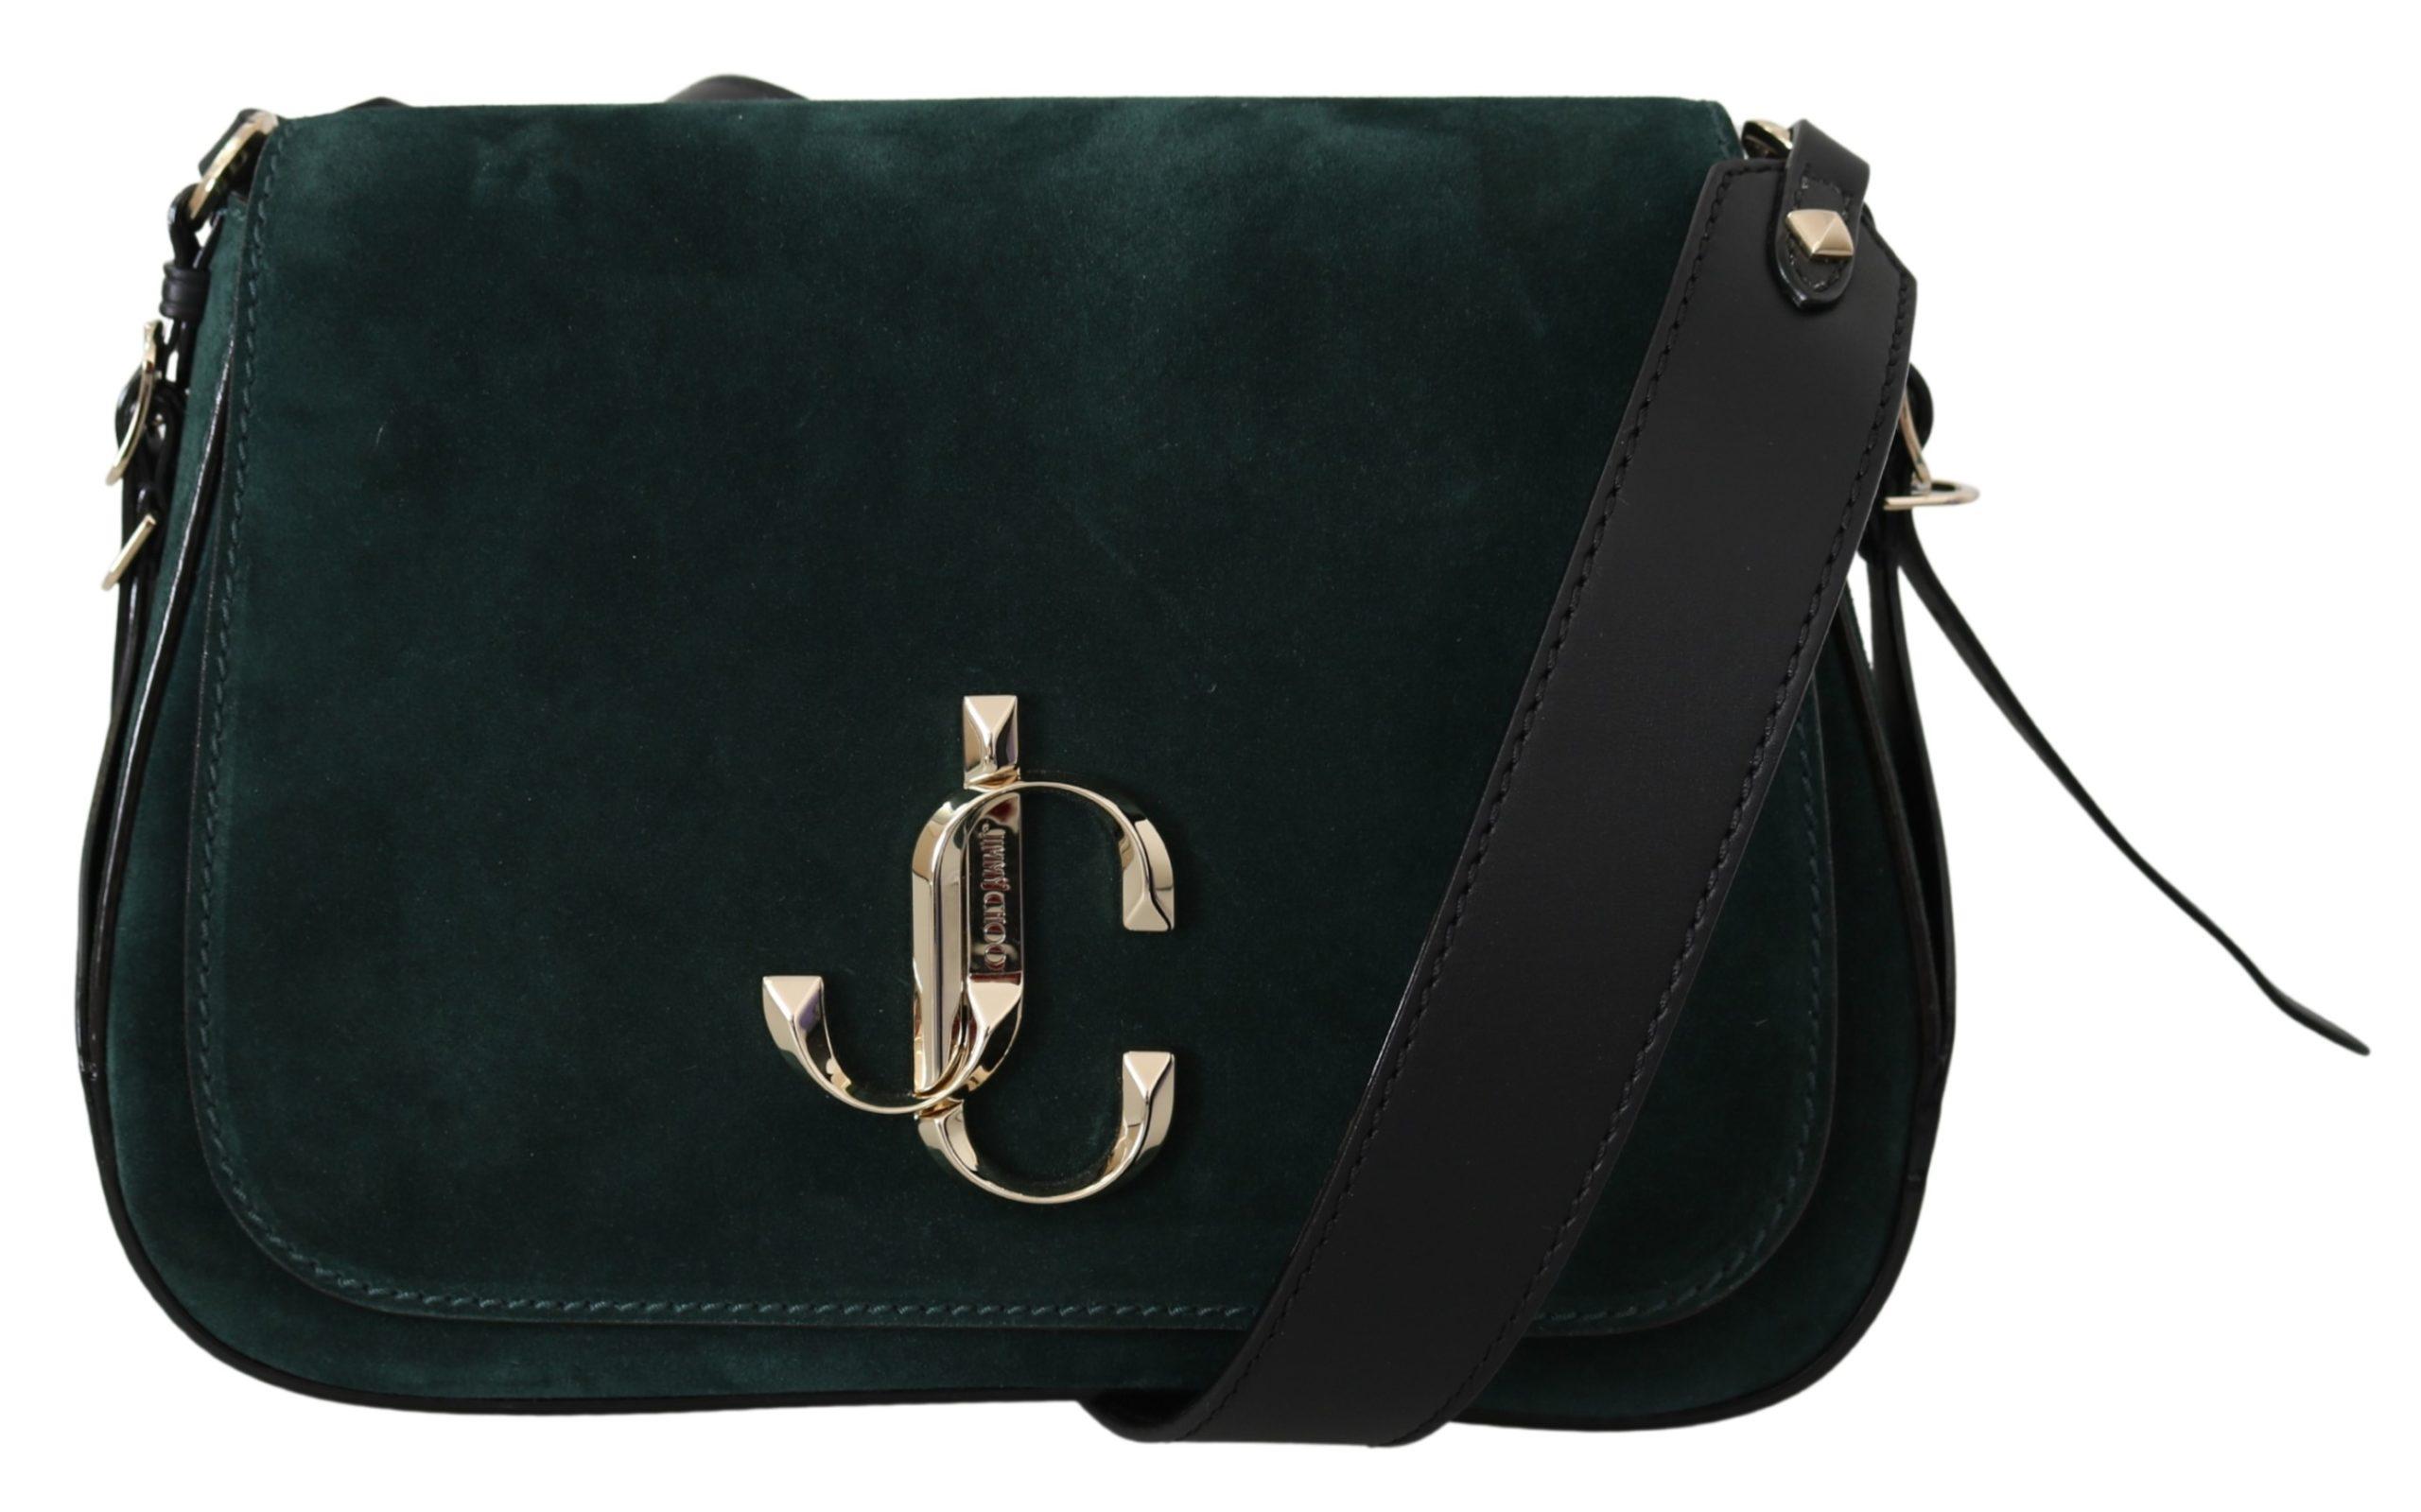 Jimmy Choo Women's Varenne Shoulder Bag Black/Dark Green 1436238